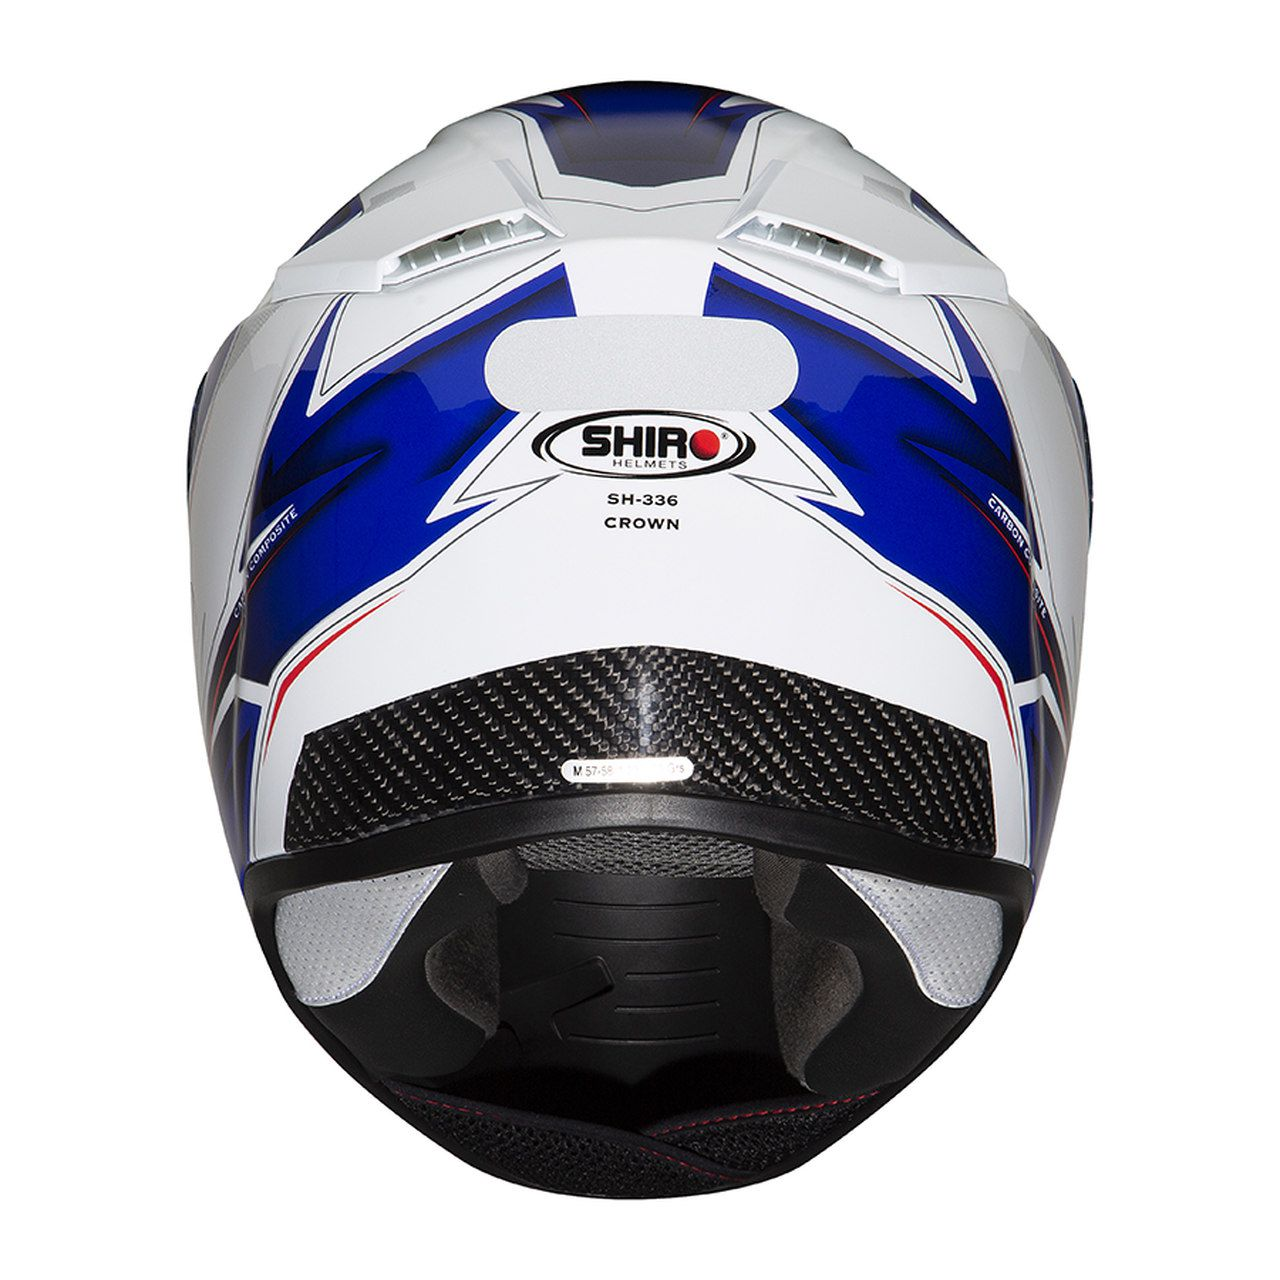 Capacete Shiro Speed Integral Racing Tricomposto SH-336 Crown Branco e Azul - Outlet